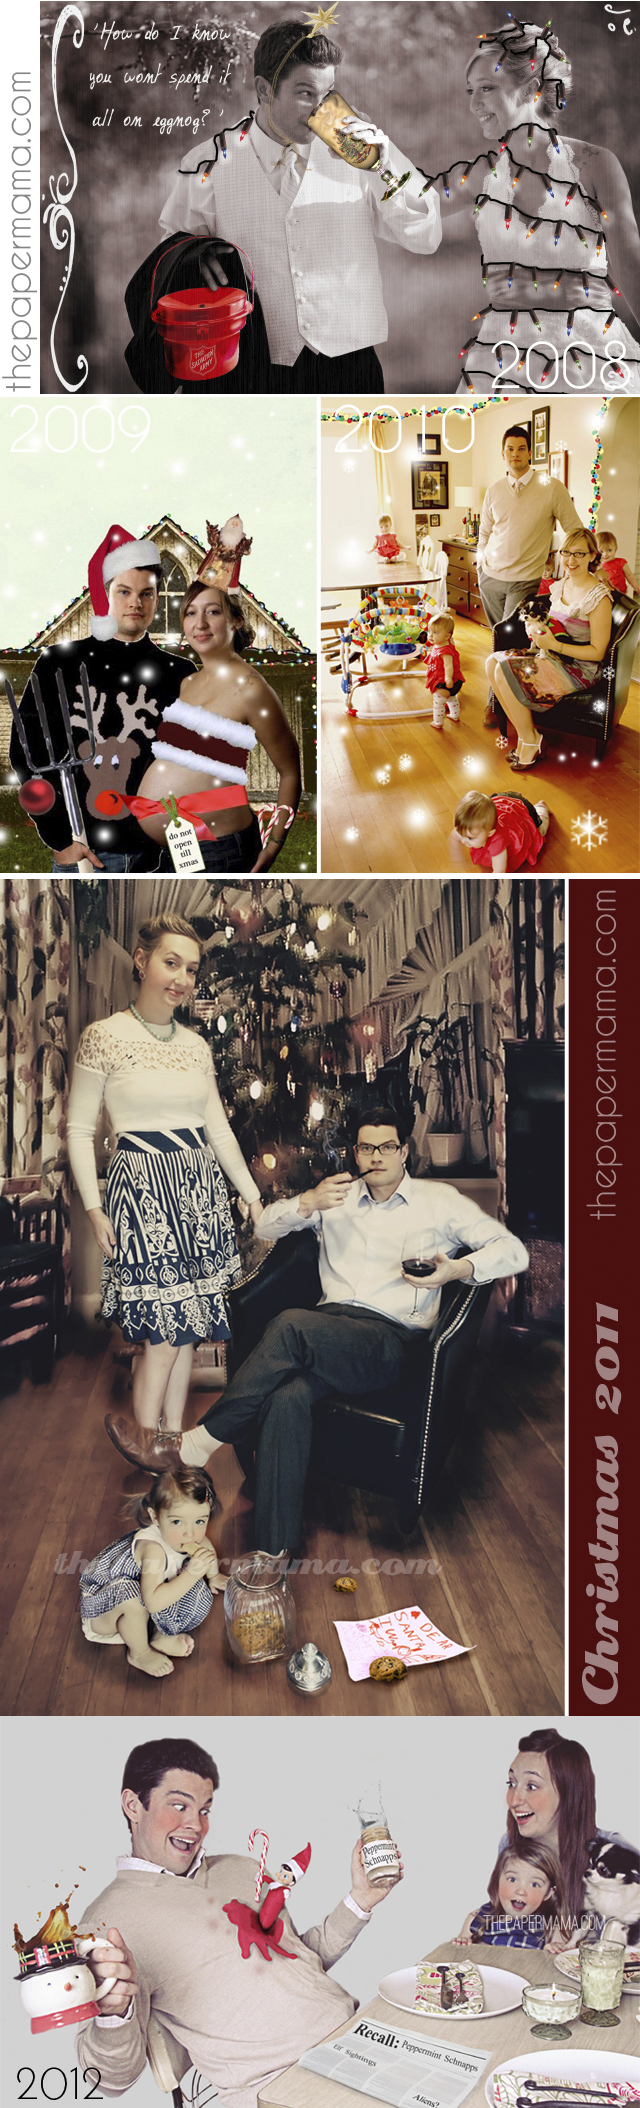 Holiday Photo Challenge // thepapermama.com